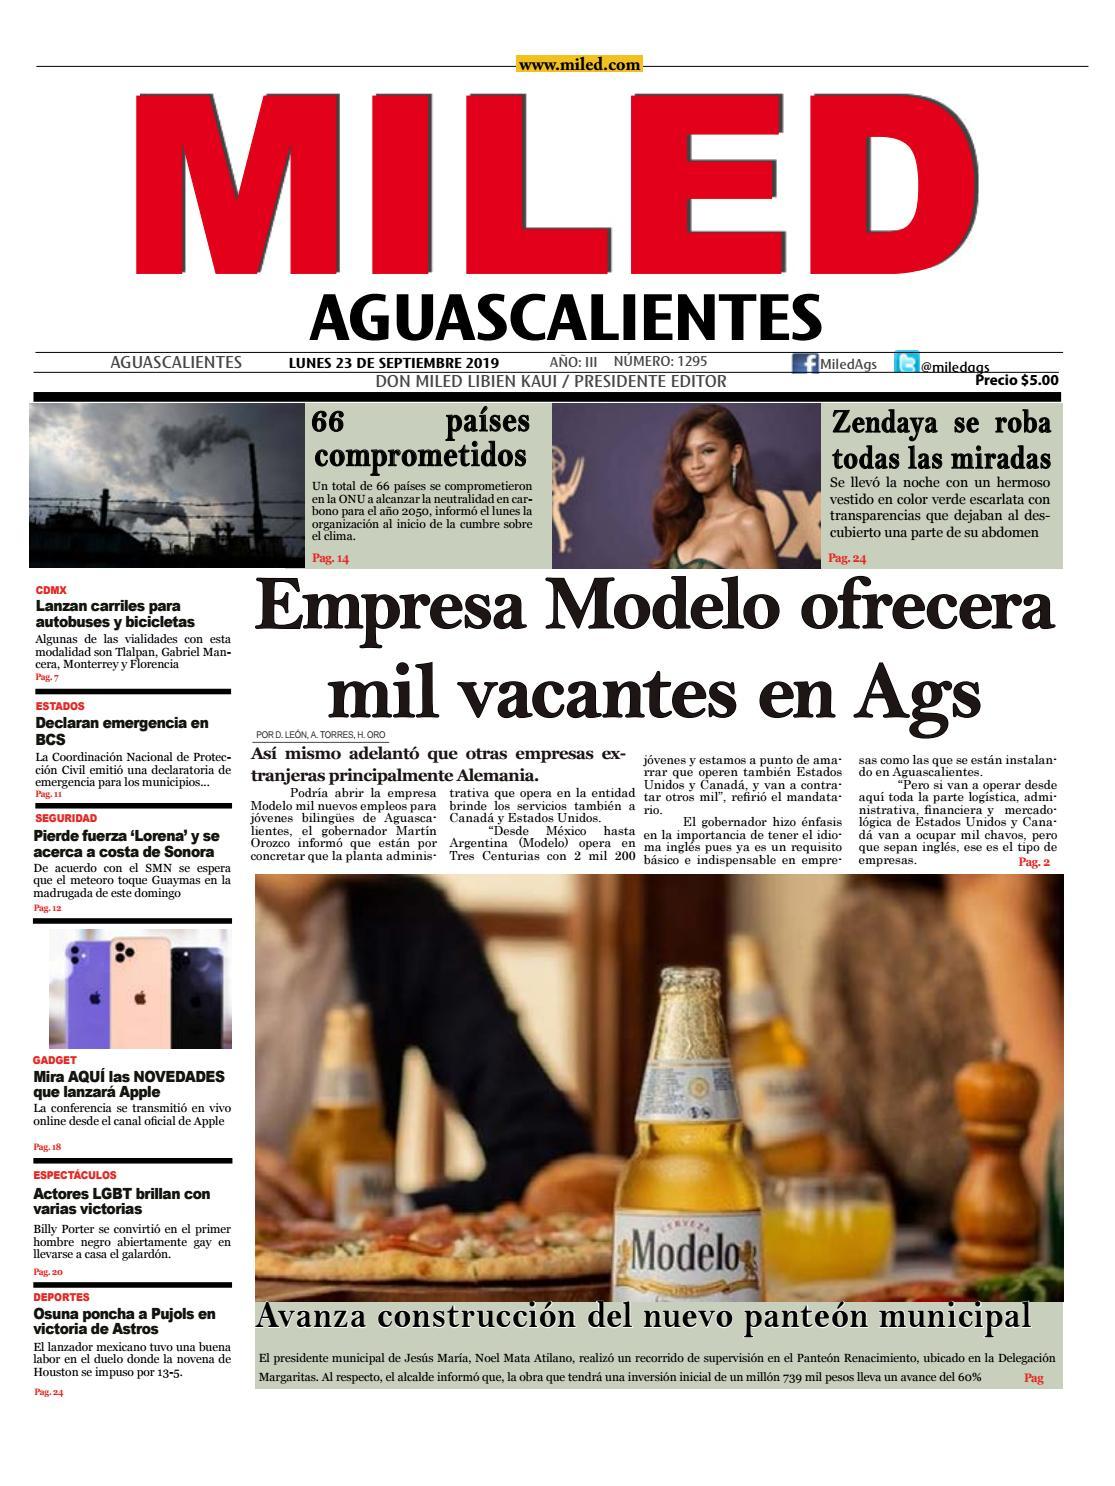 Miled Aguascalientes 23 09 19 By Miled Estados Issuu